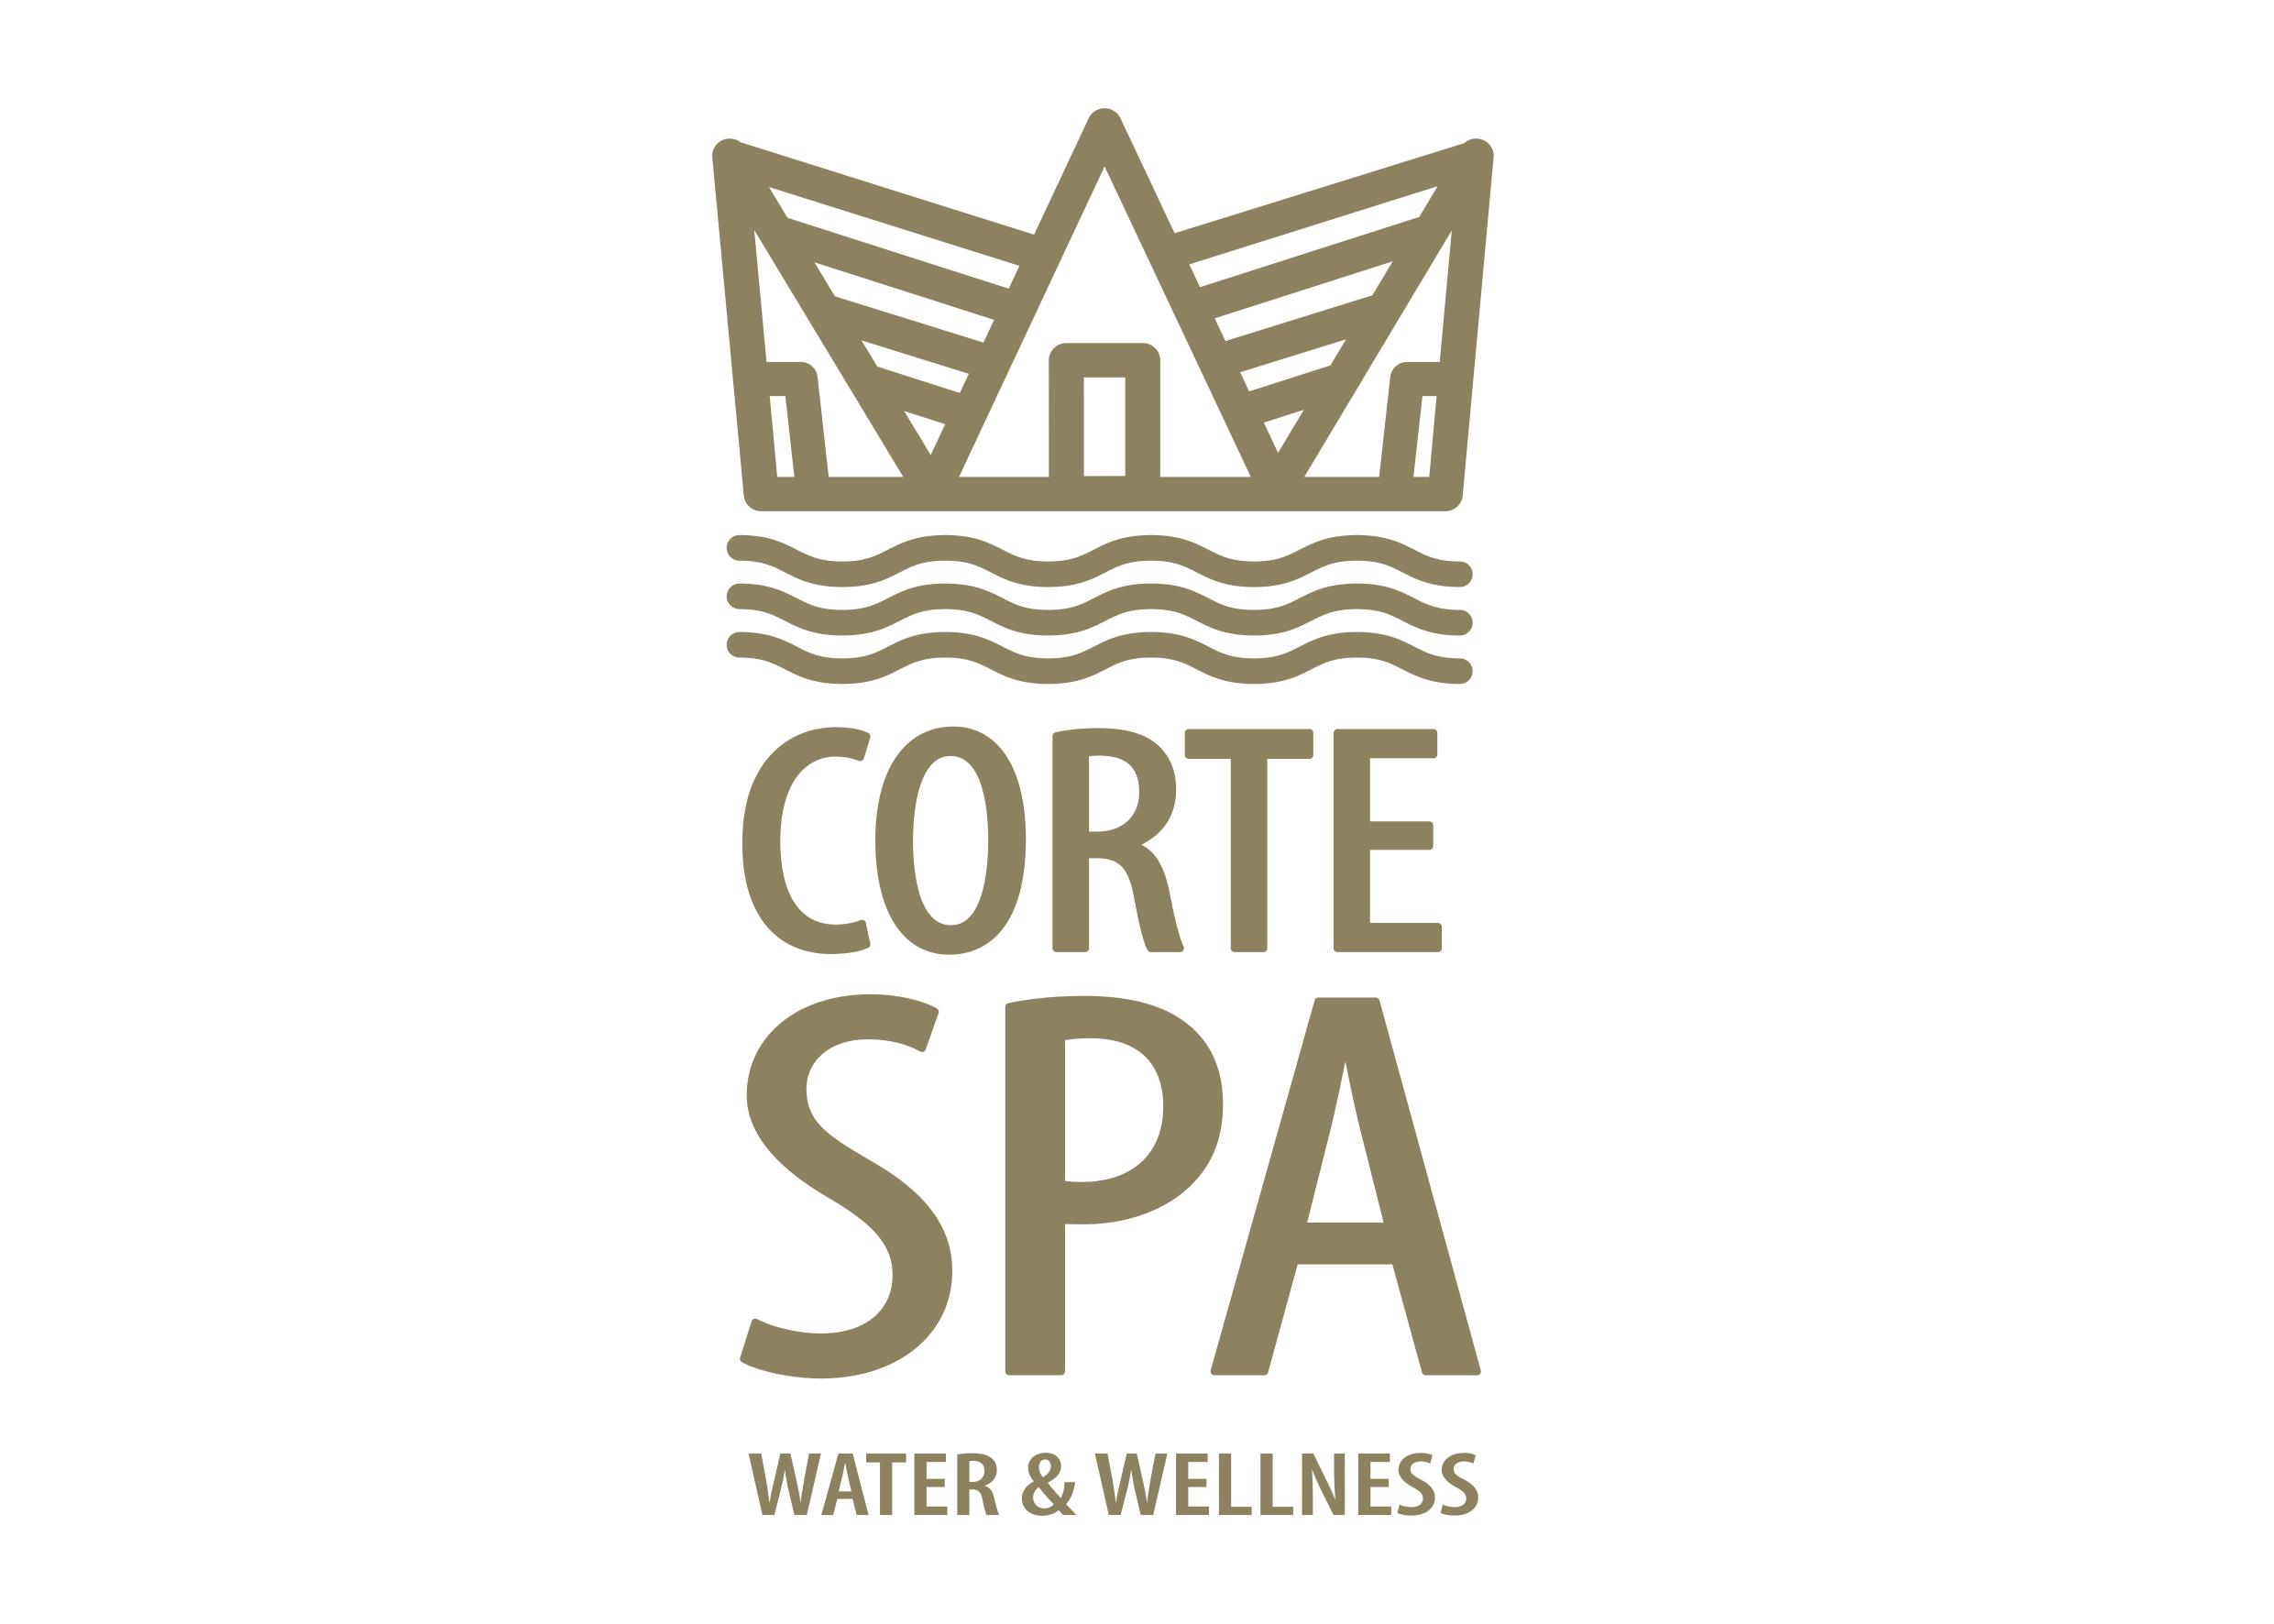 http://dolomitimountainresort.com/wp-content/uploads/2016/06/Logo-Corte-SPA.jpg